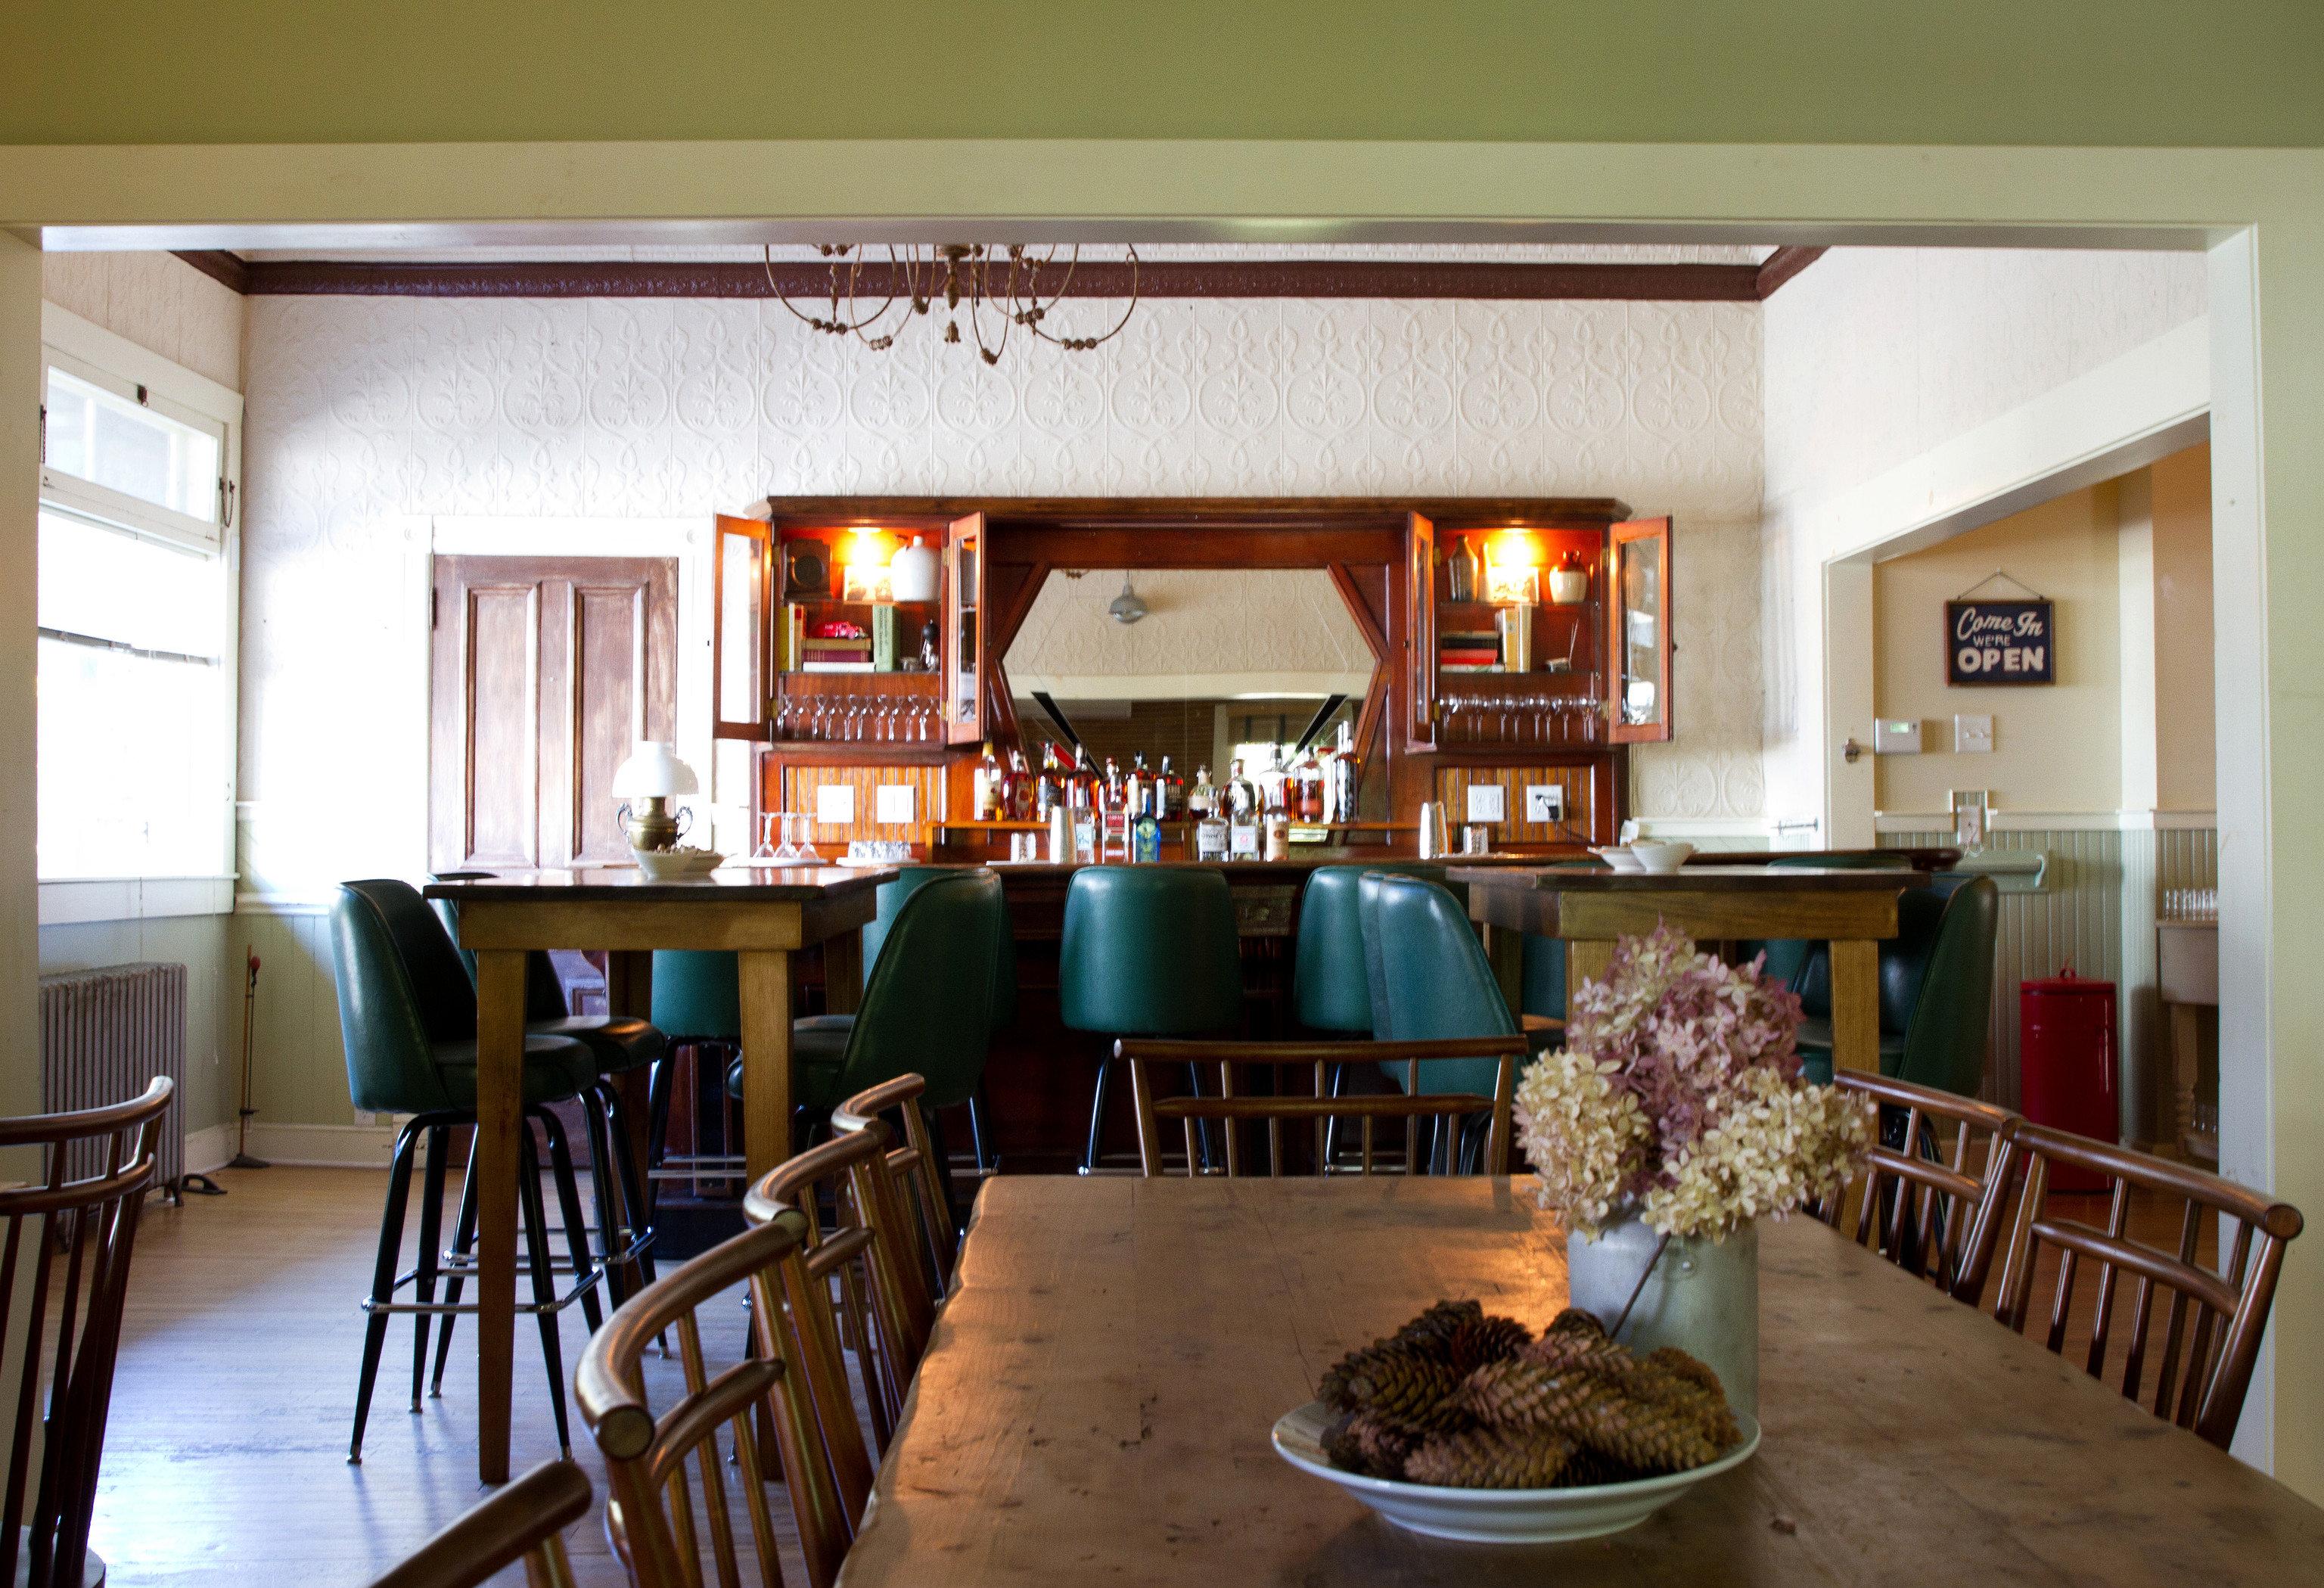 chair property Dining restaurant home Bar living room Resort